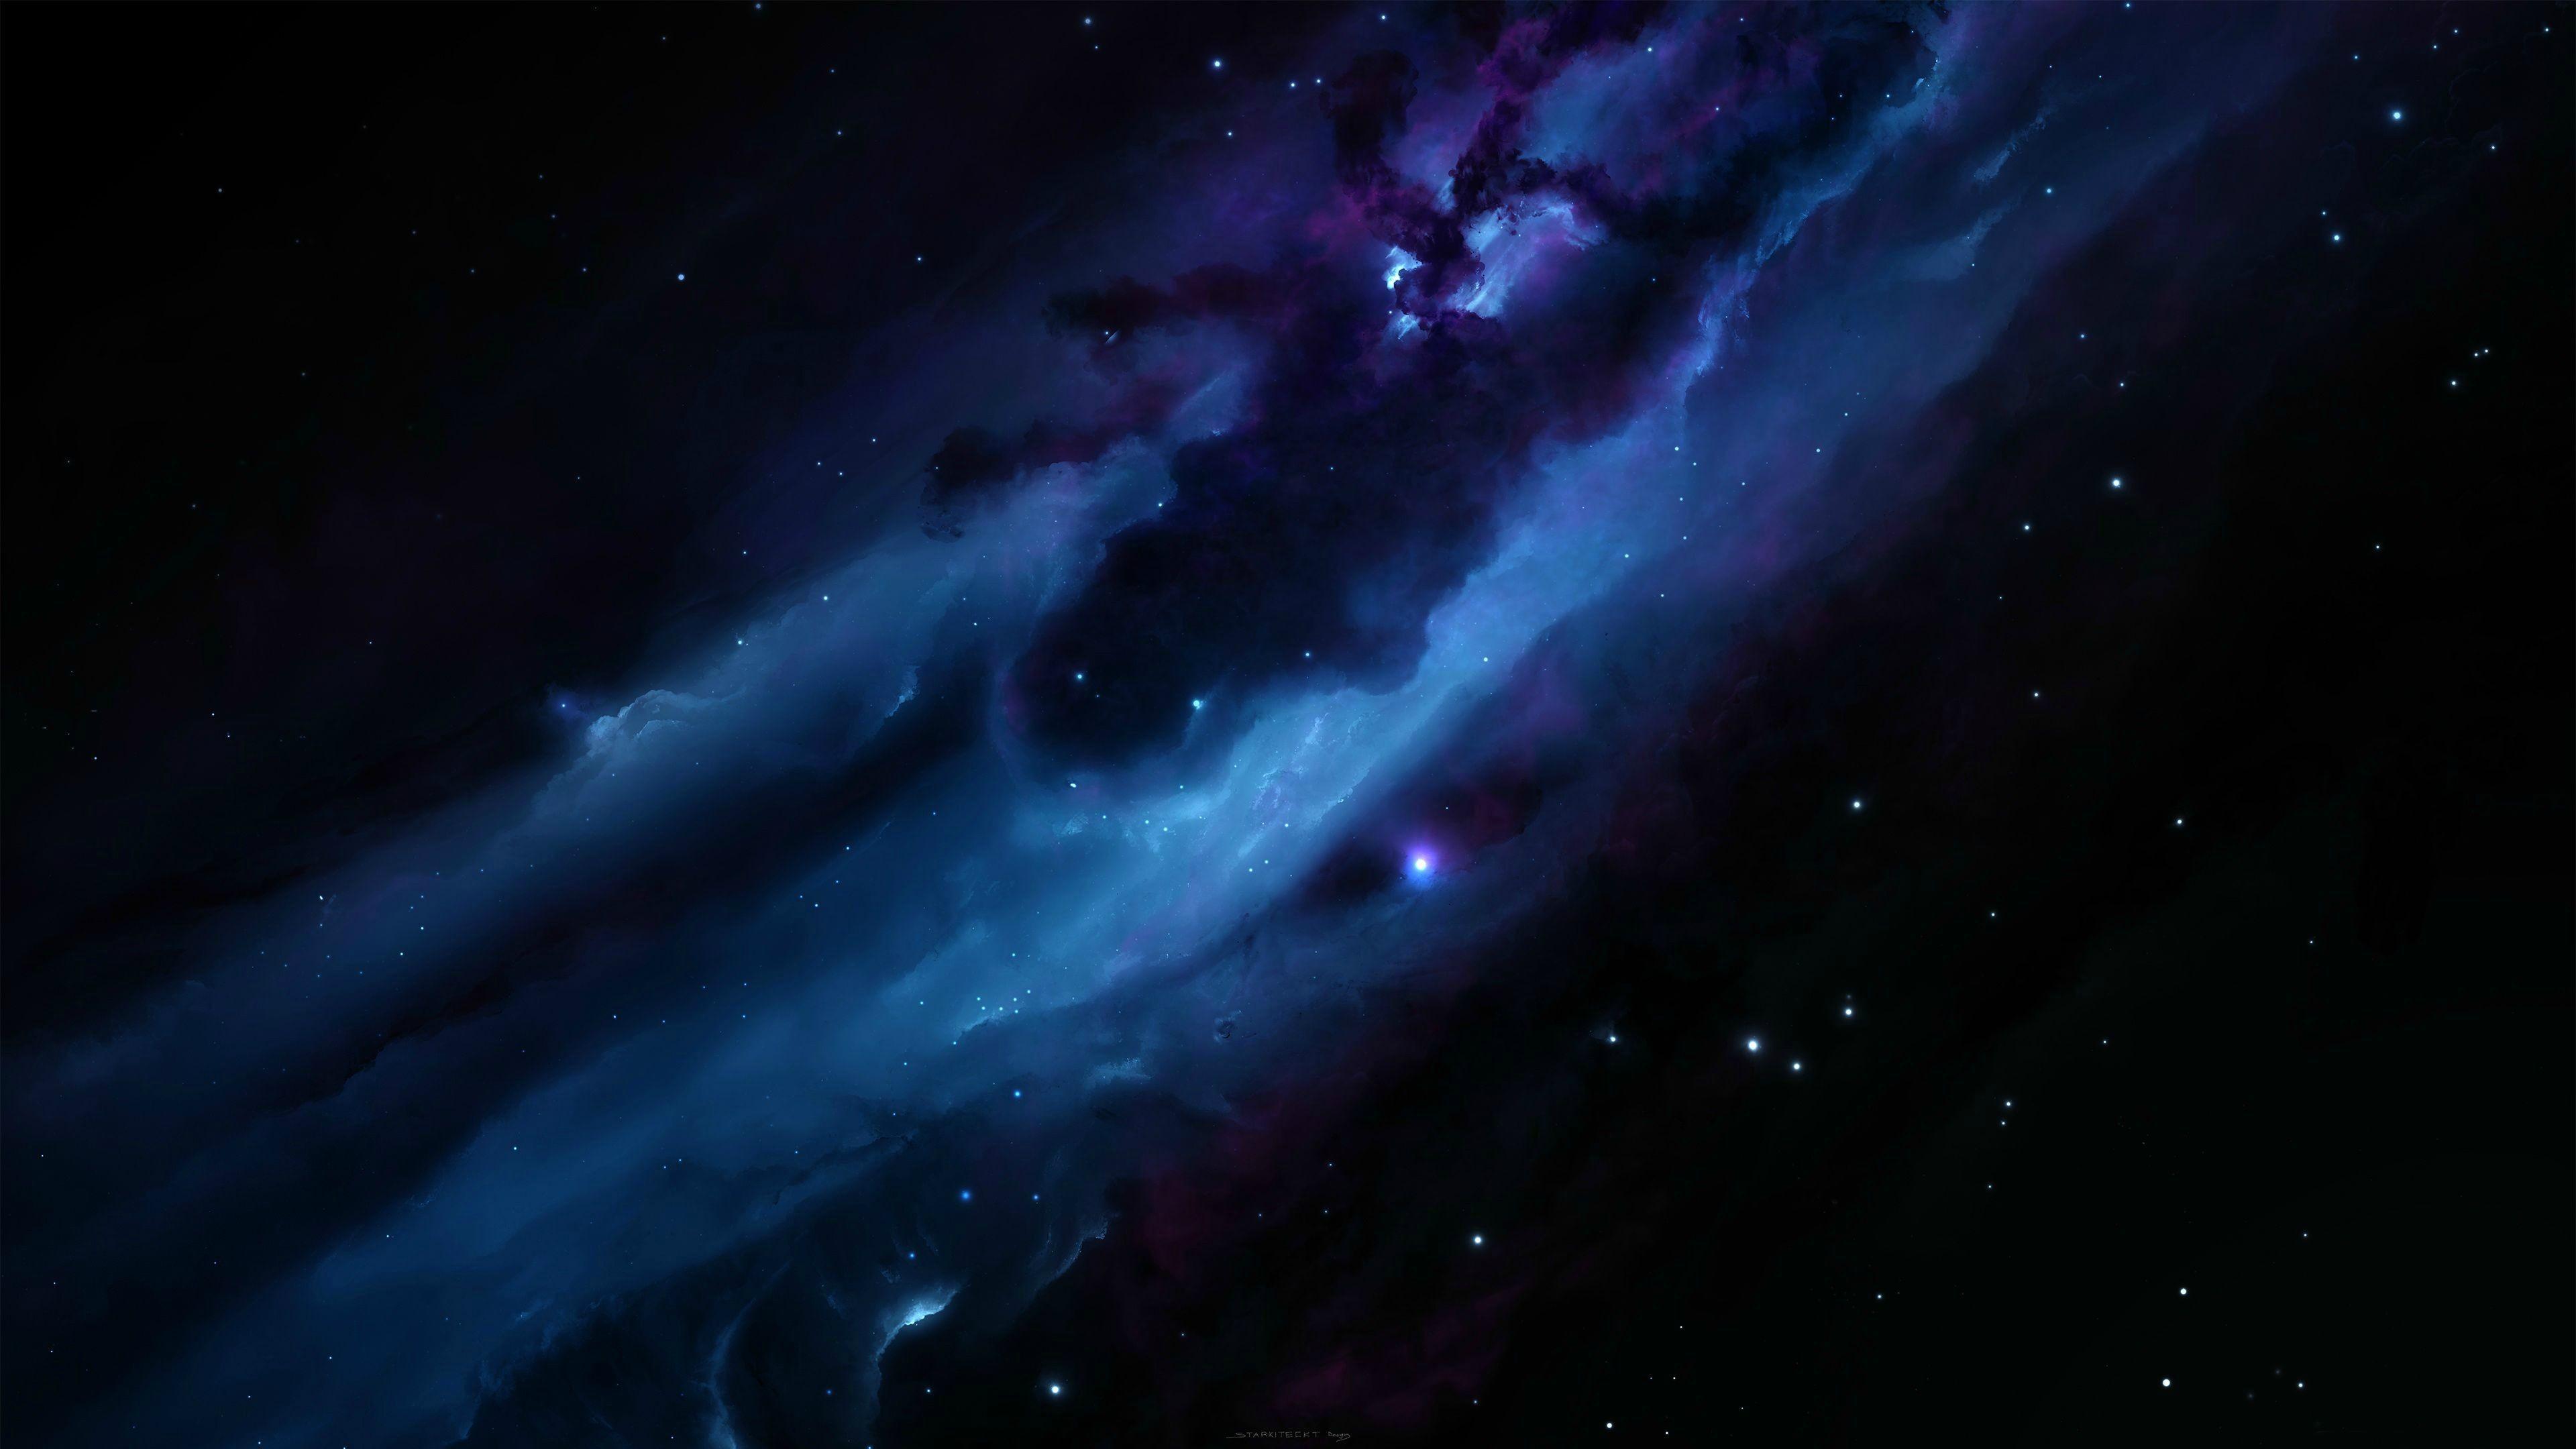 4k Galaxies & More Wallpapers